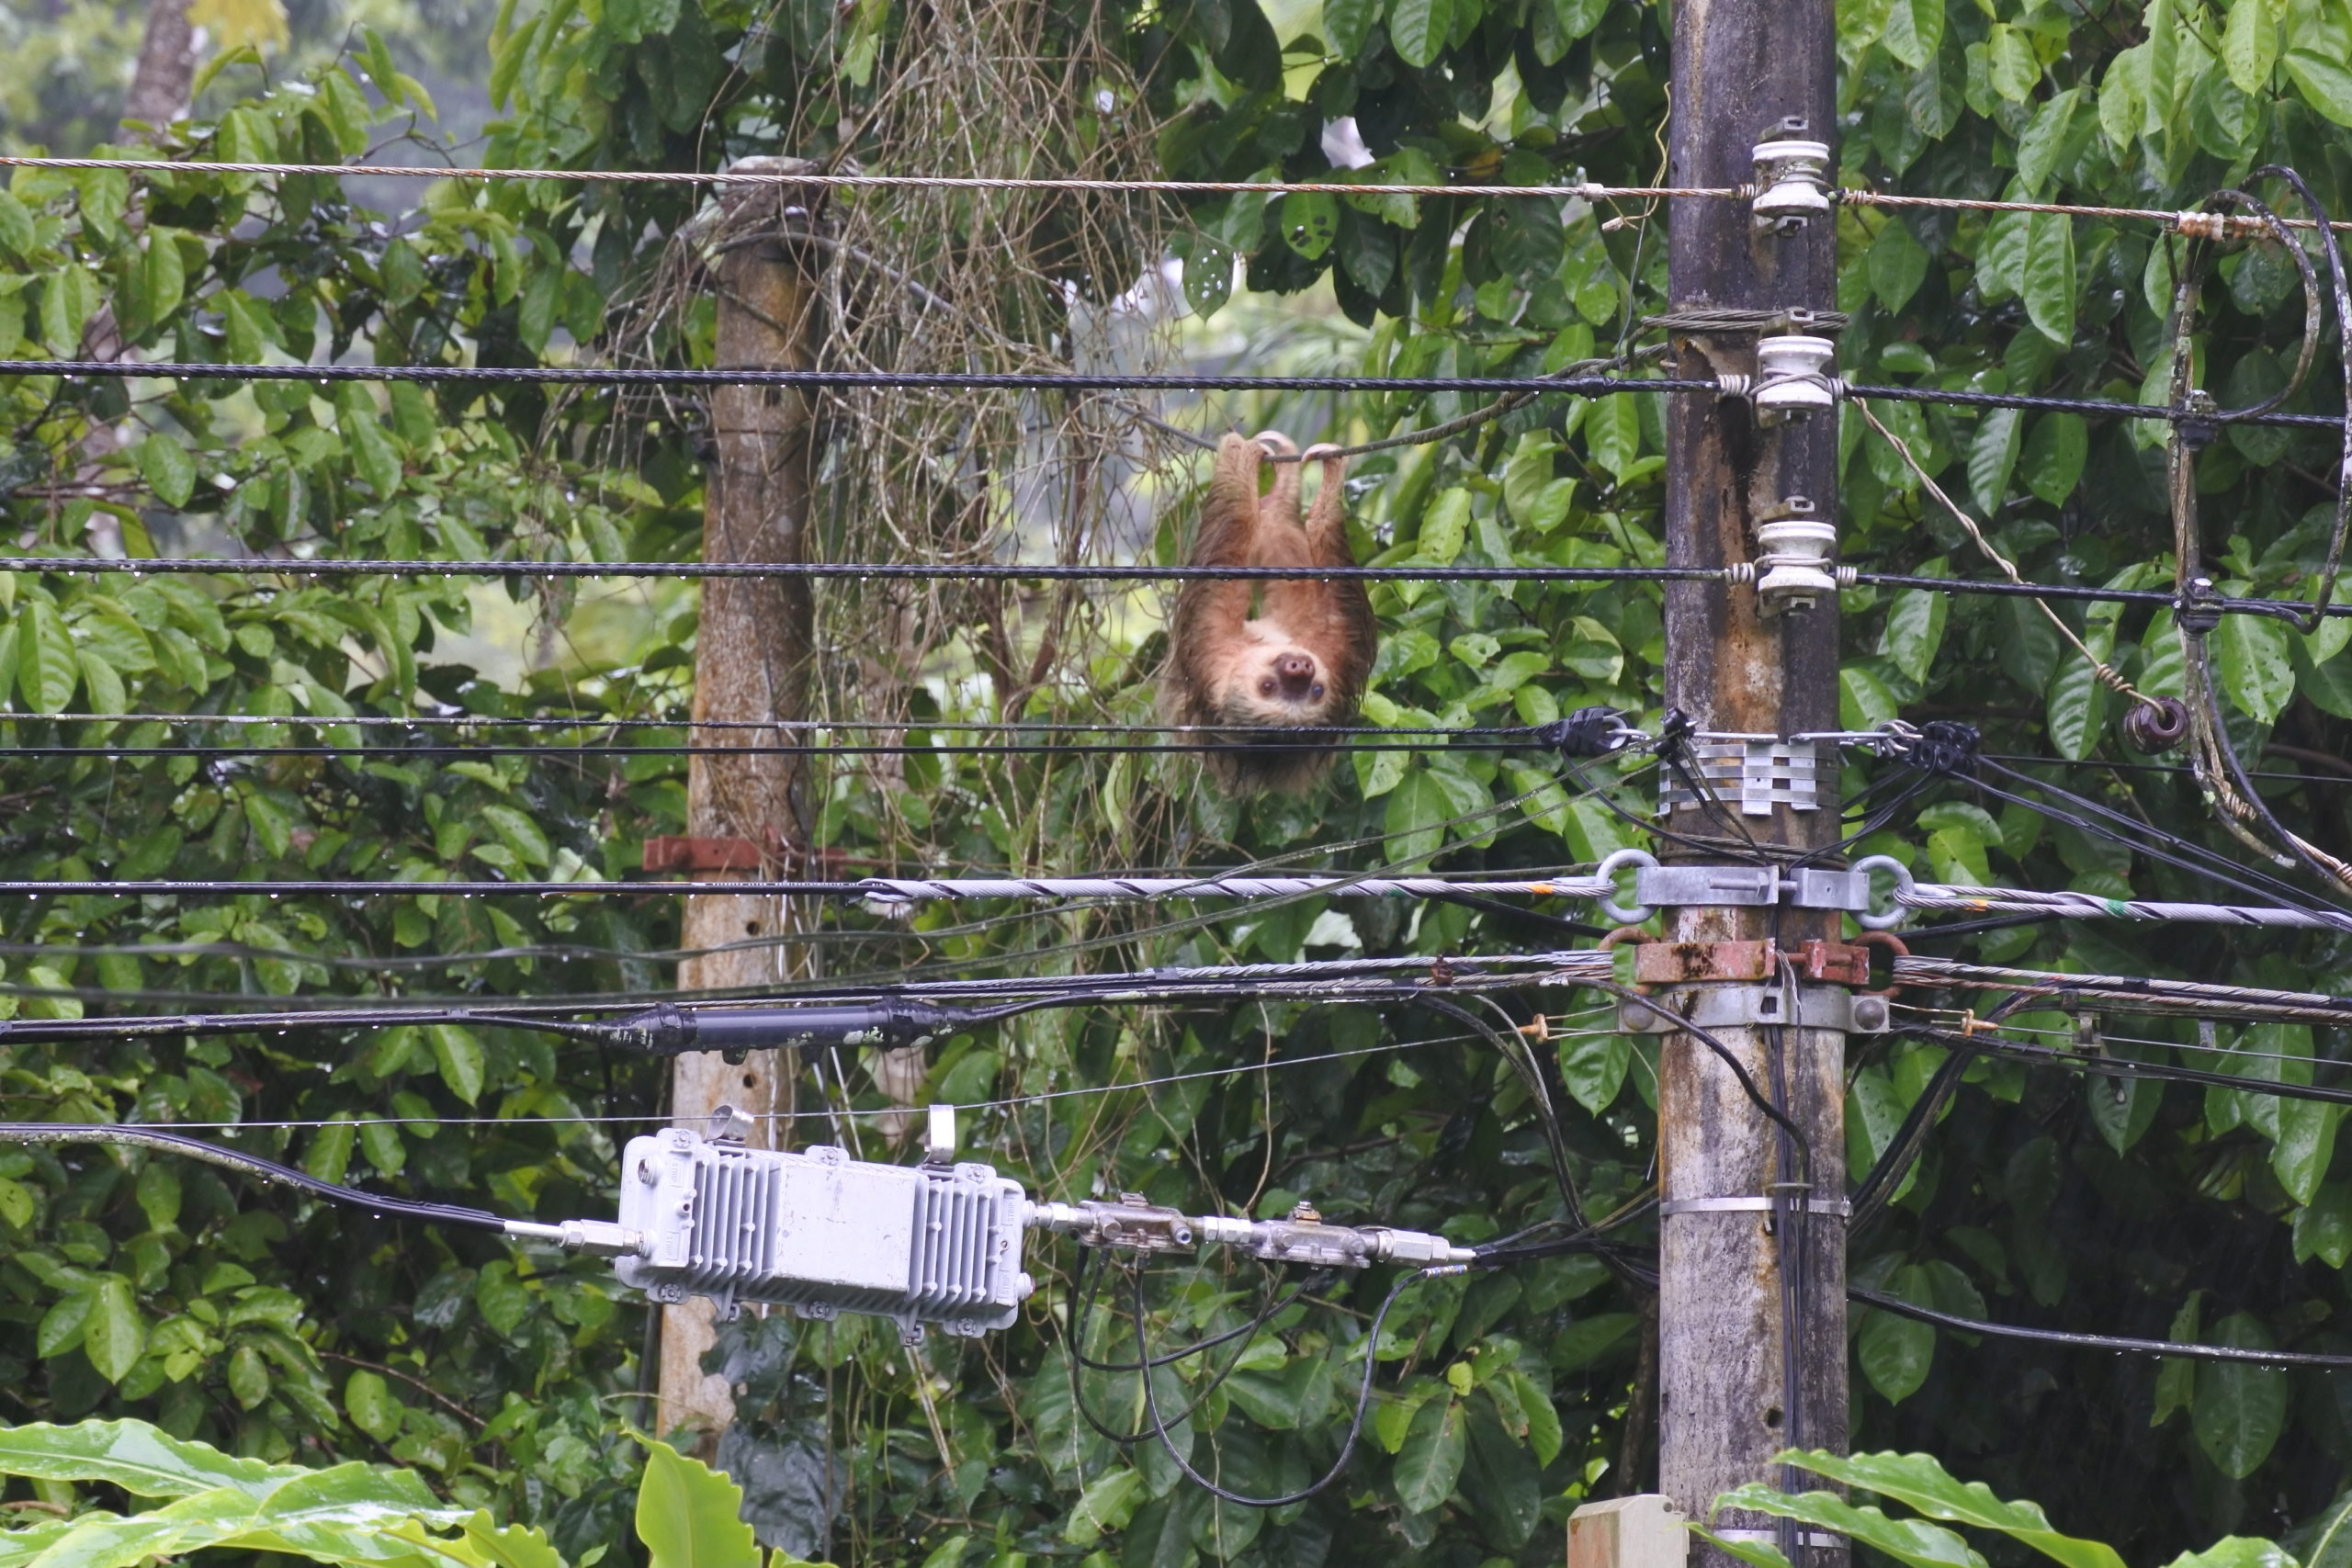 sloth on power line